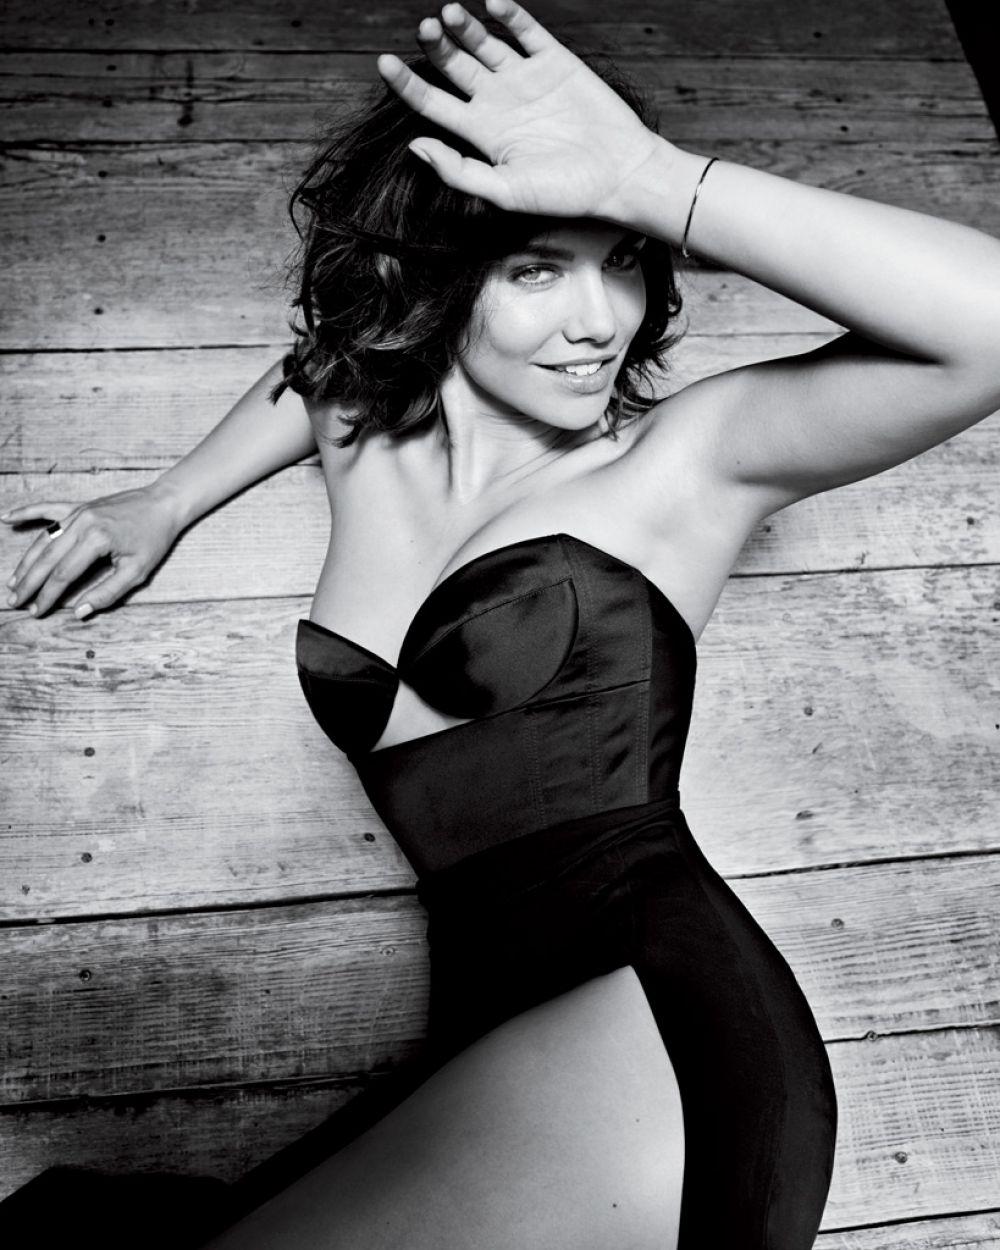 Alyssa Arce Topless photos   The Fappening. 2014-2020